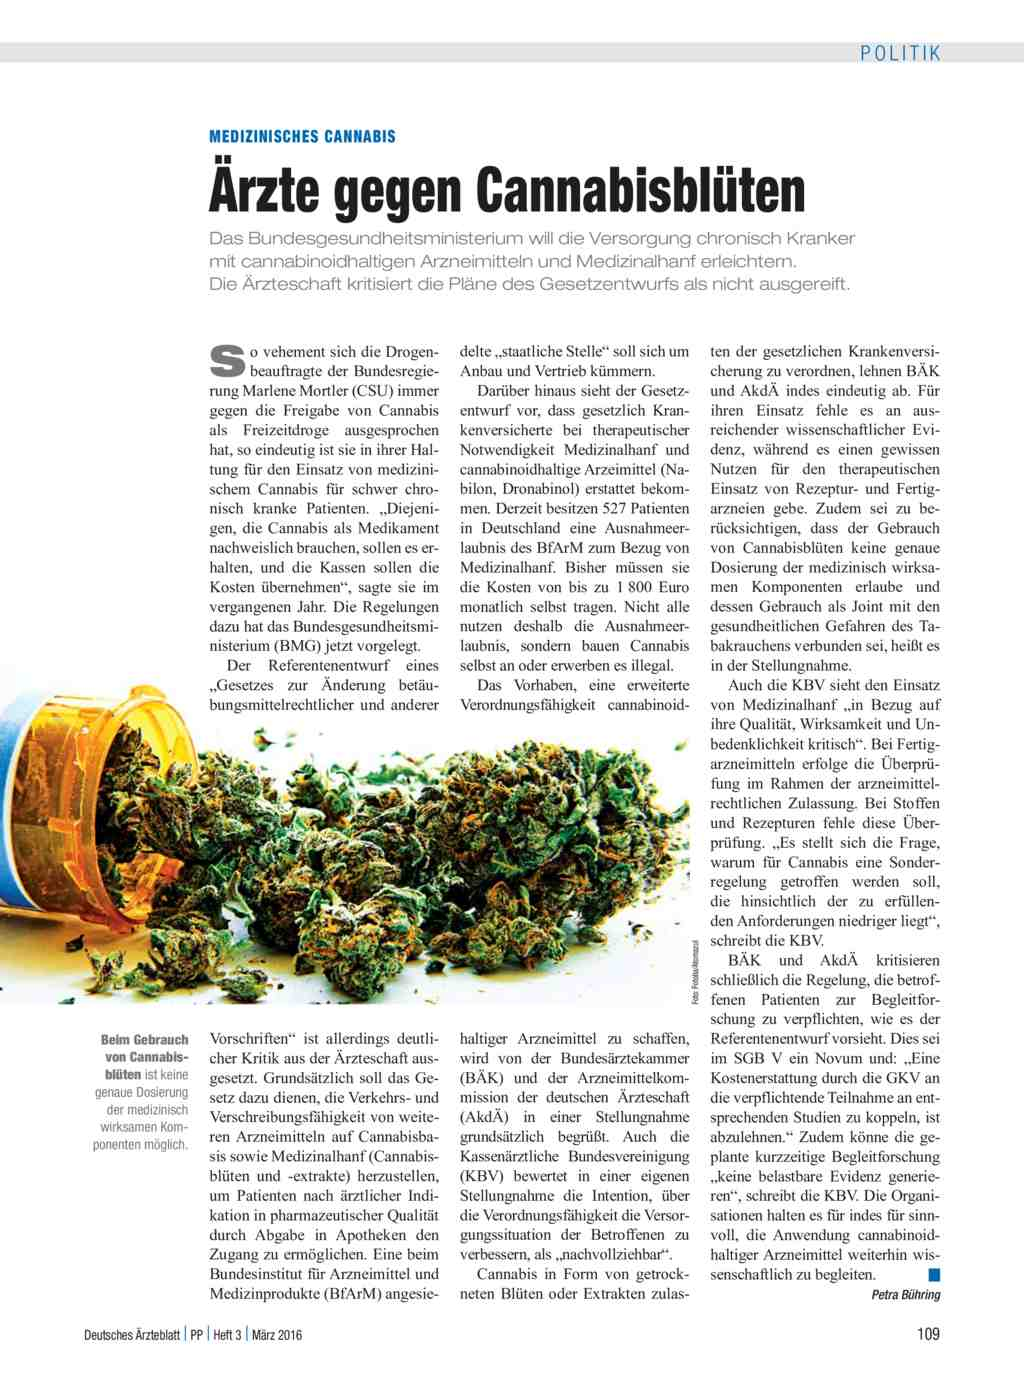 Kannabis Verikoe